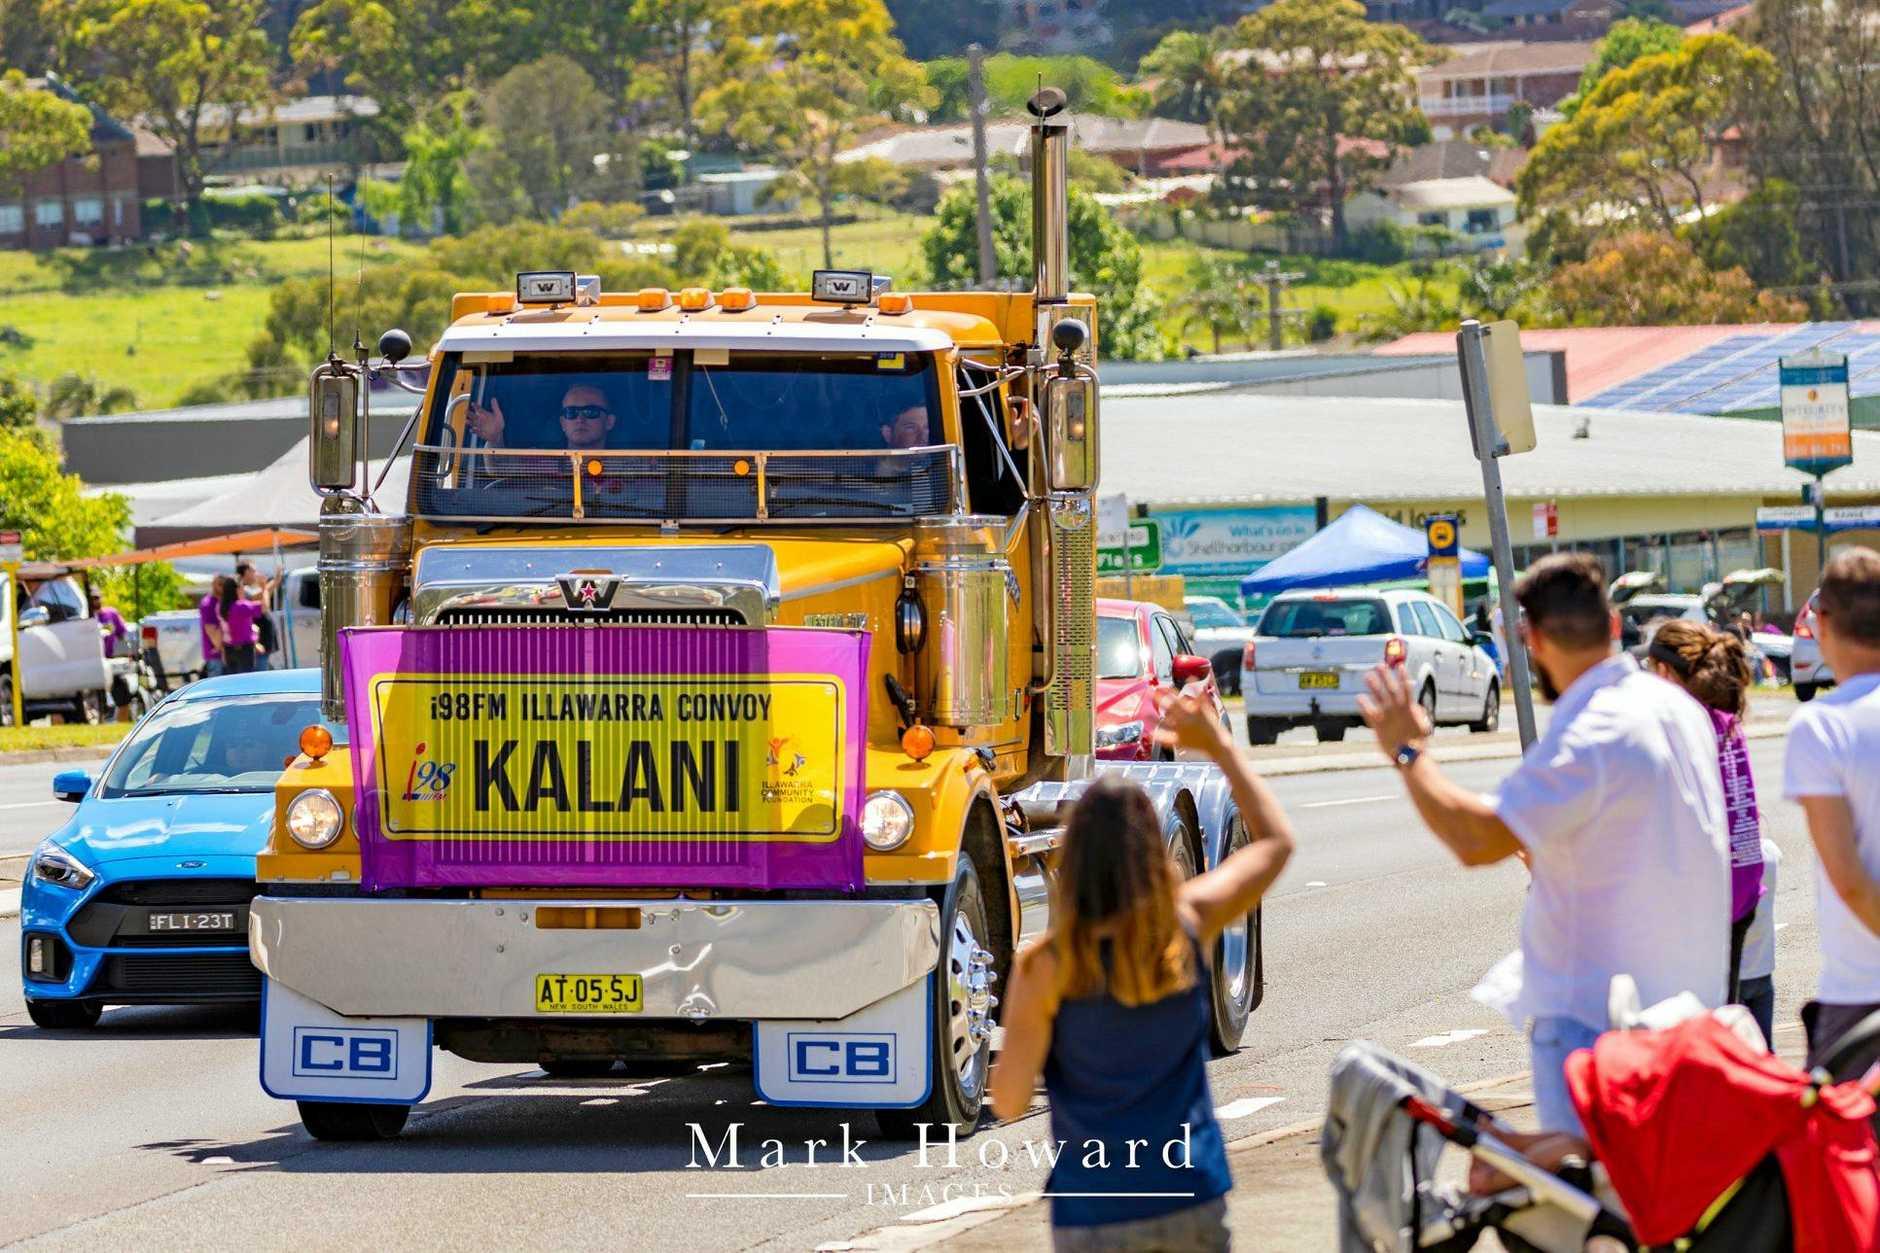 i98FM Illawarra Convoy 2018